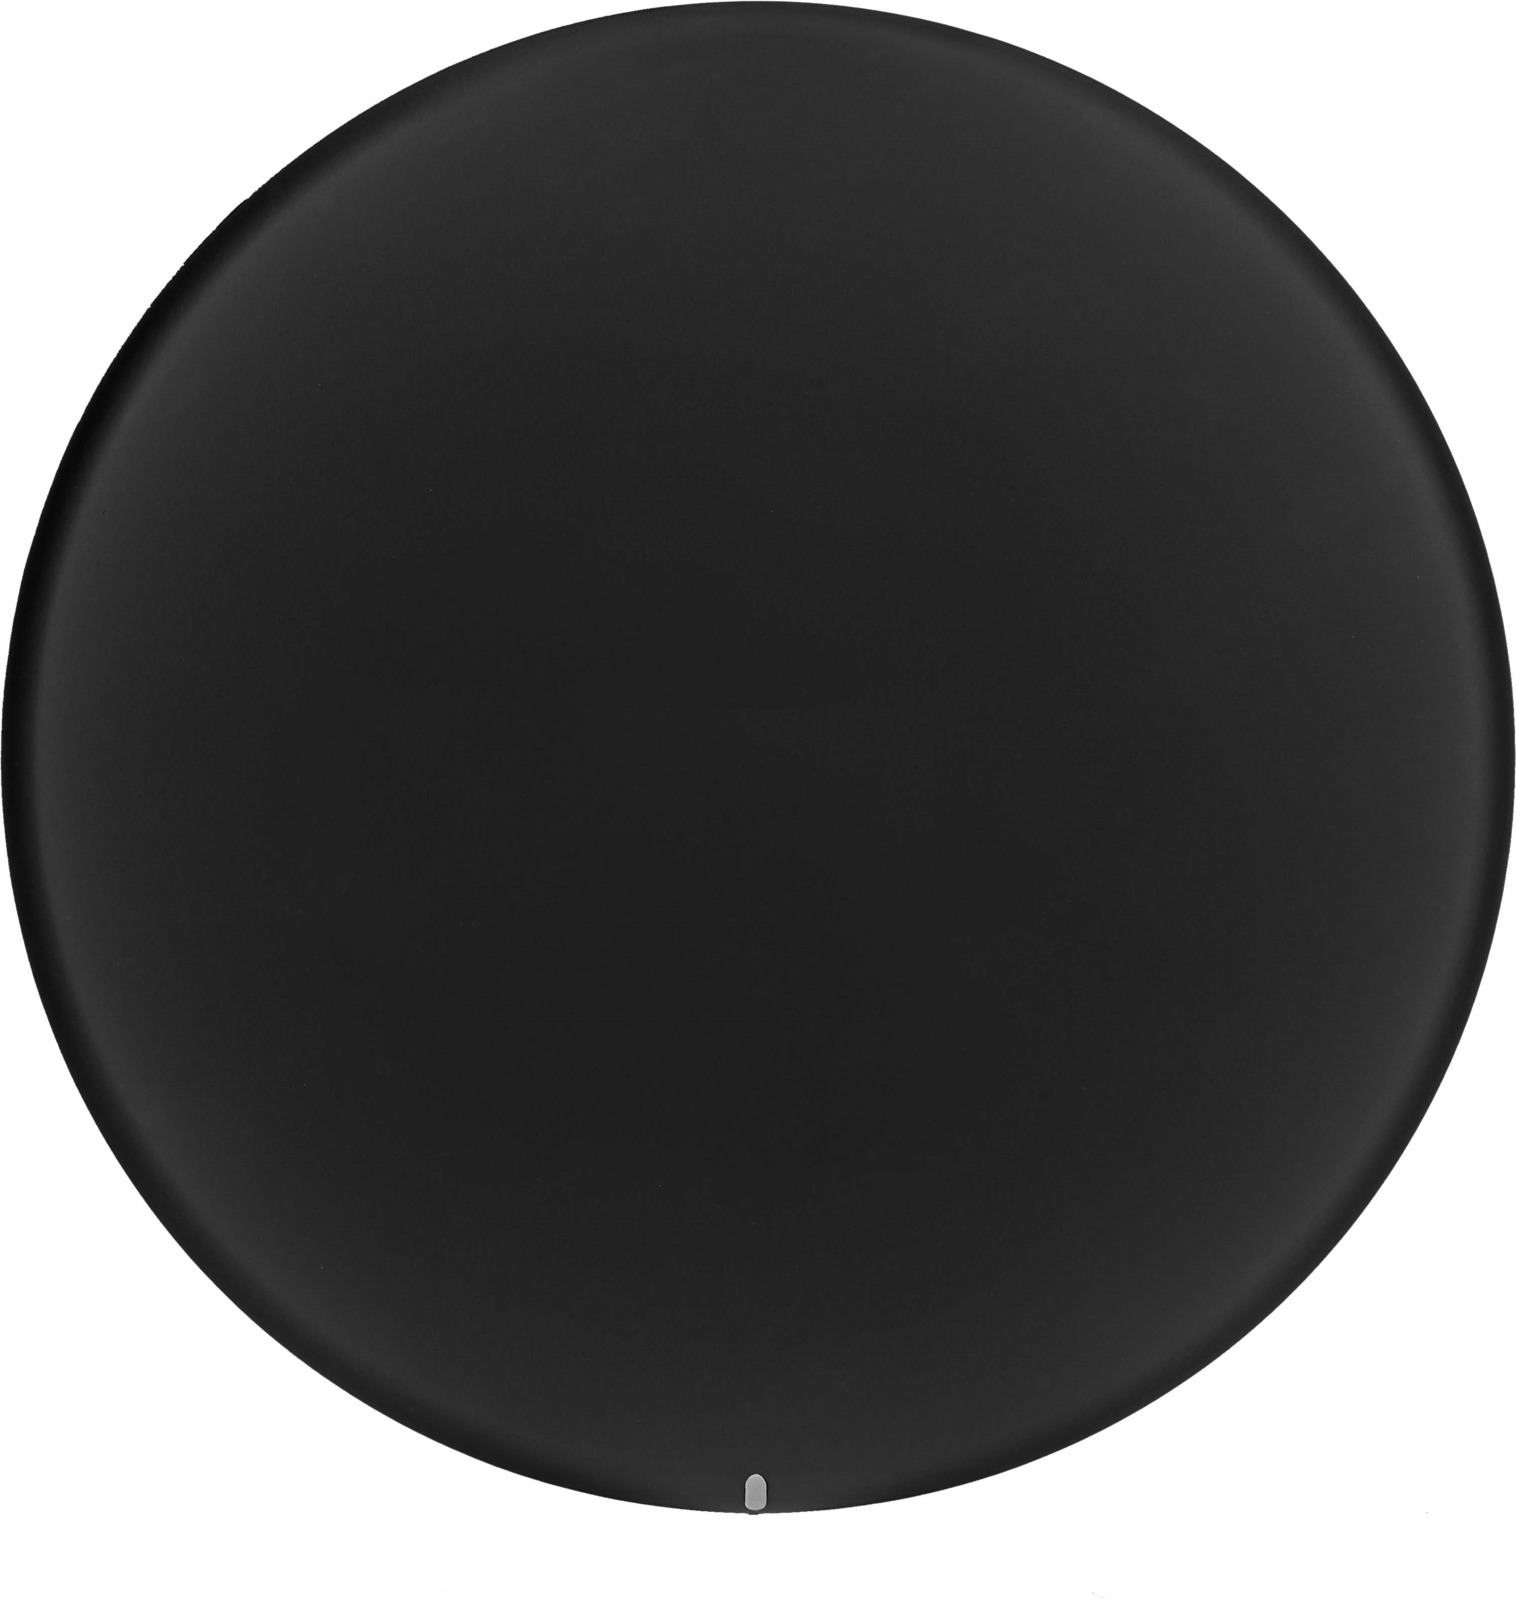 цена на Беспроводное зарядное устройство uBear Flow Wireless Charger, WL02BL10-AD, черный